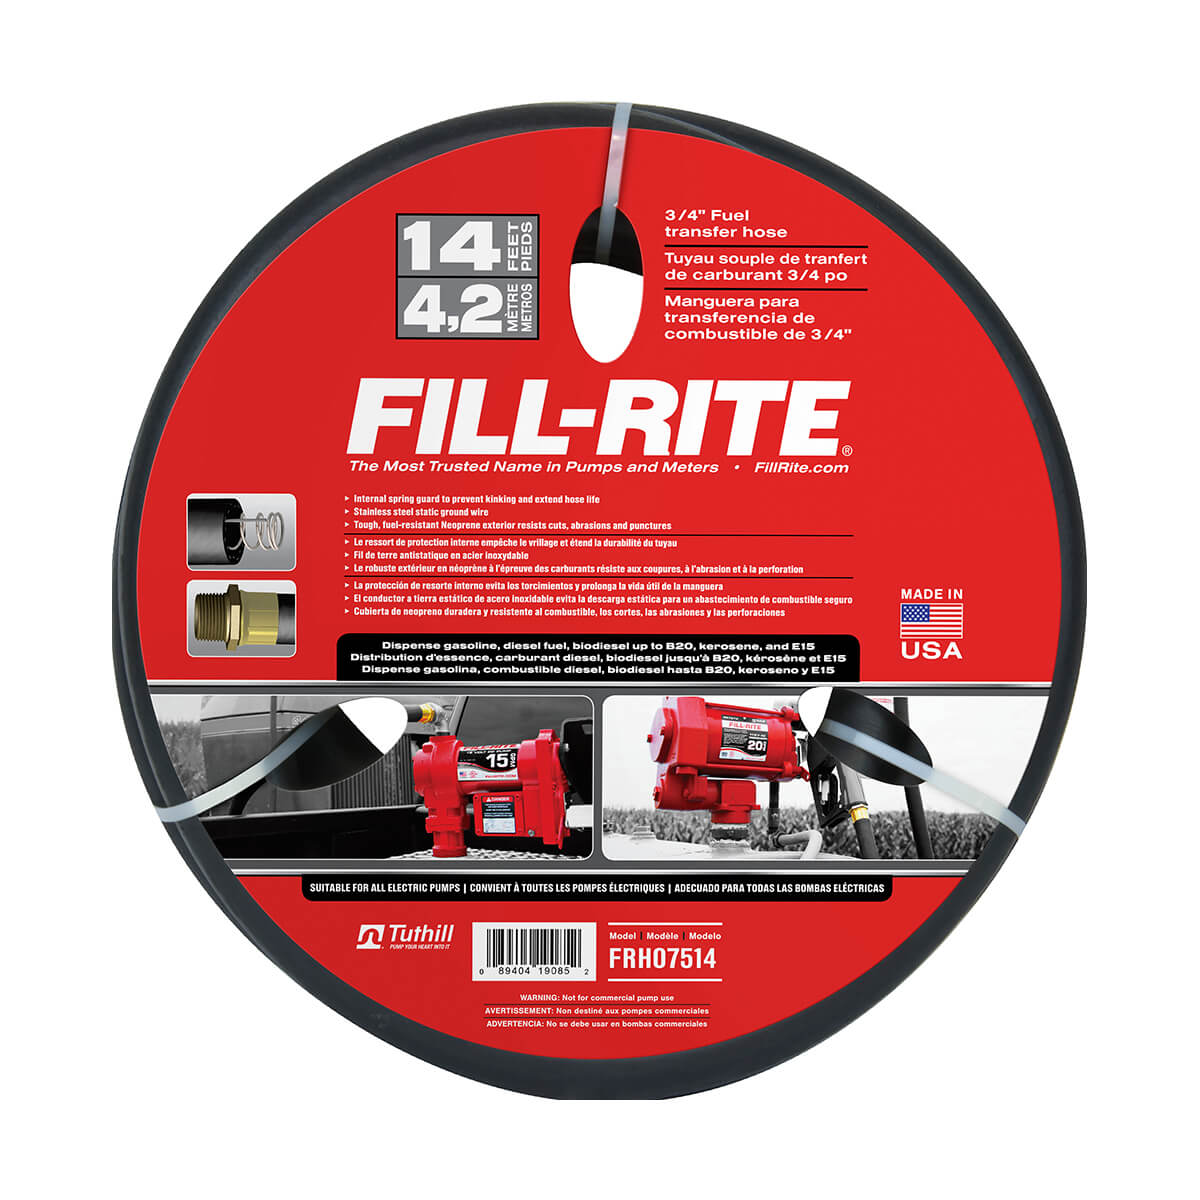 "3/4"" x 14' Fill-Rite Retail Hose"